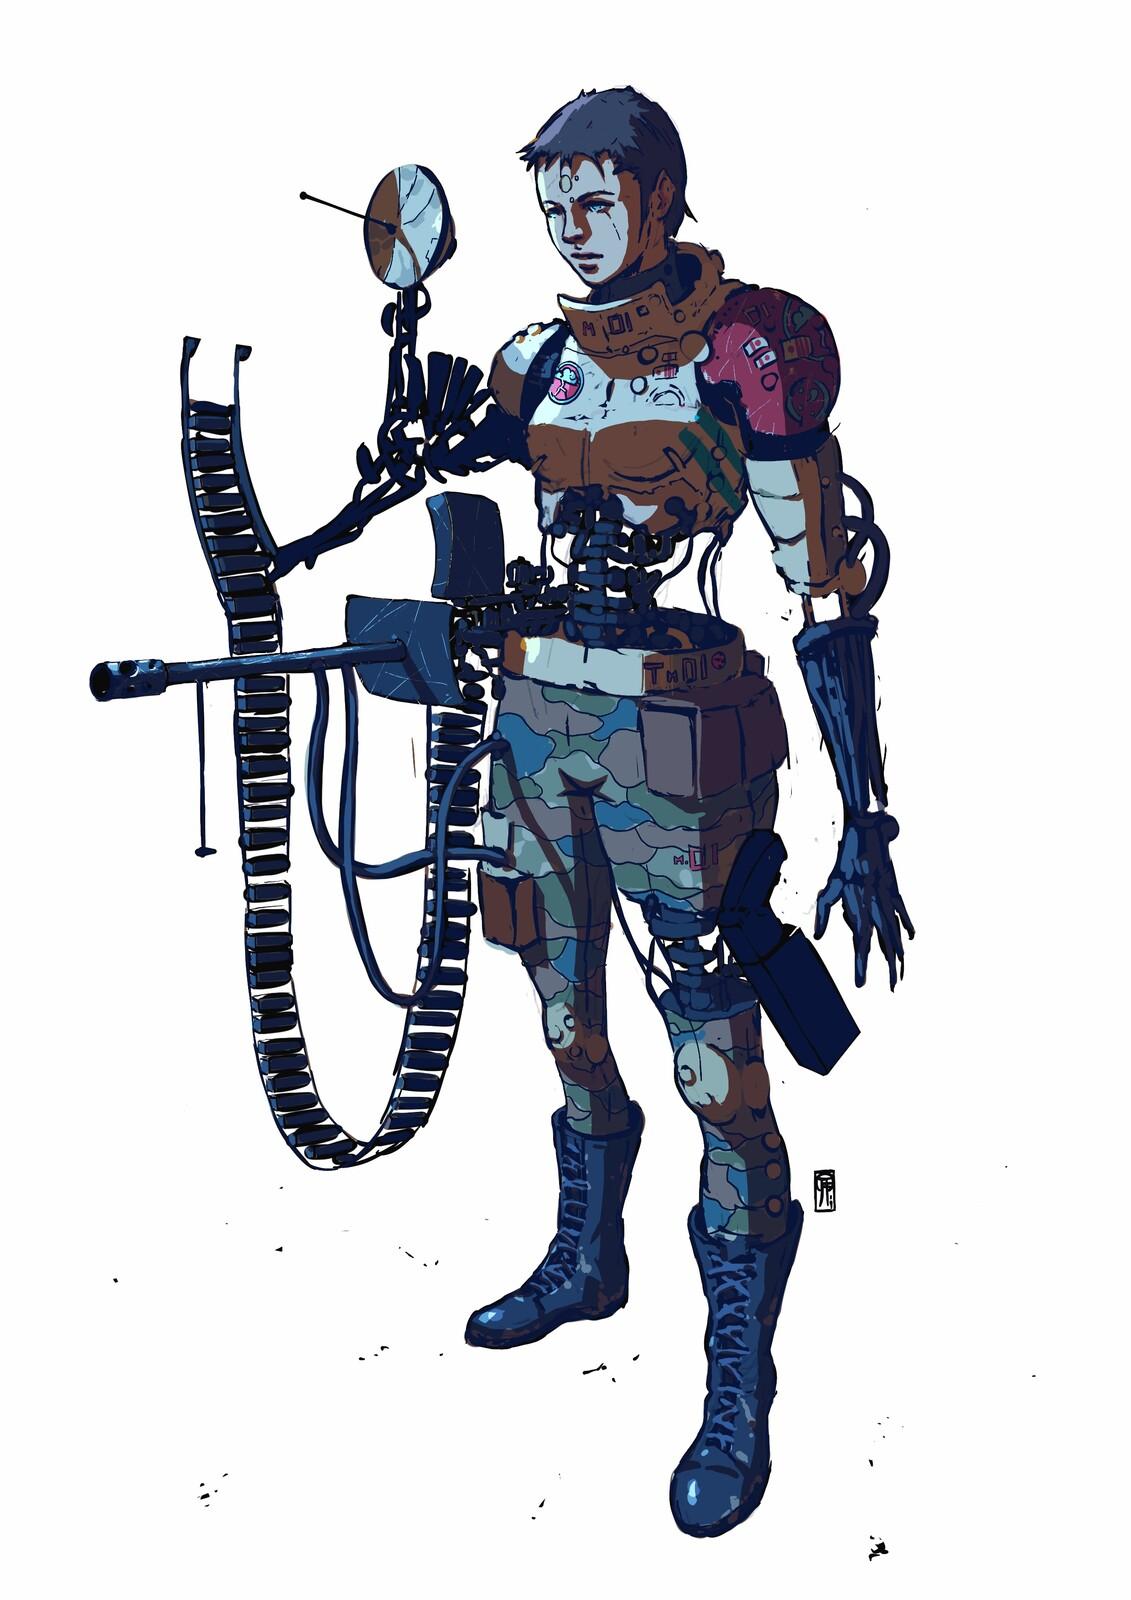 Threshold_Tactical_Unit//Light/Color/Rendering_Test02